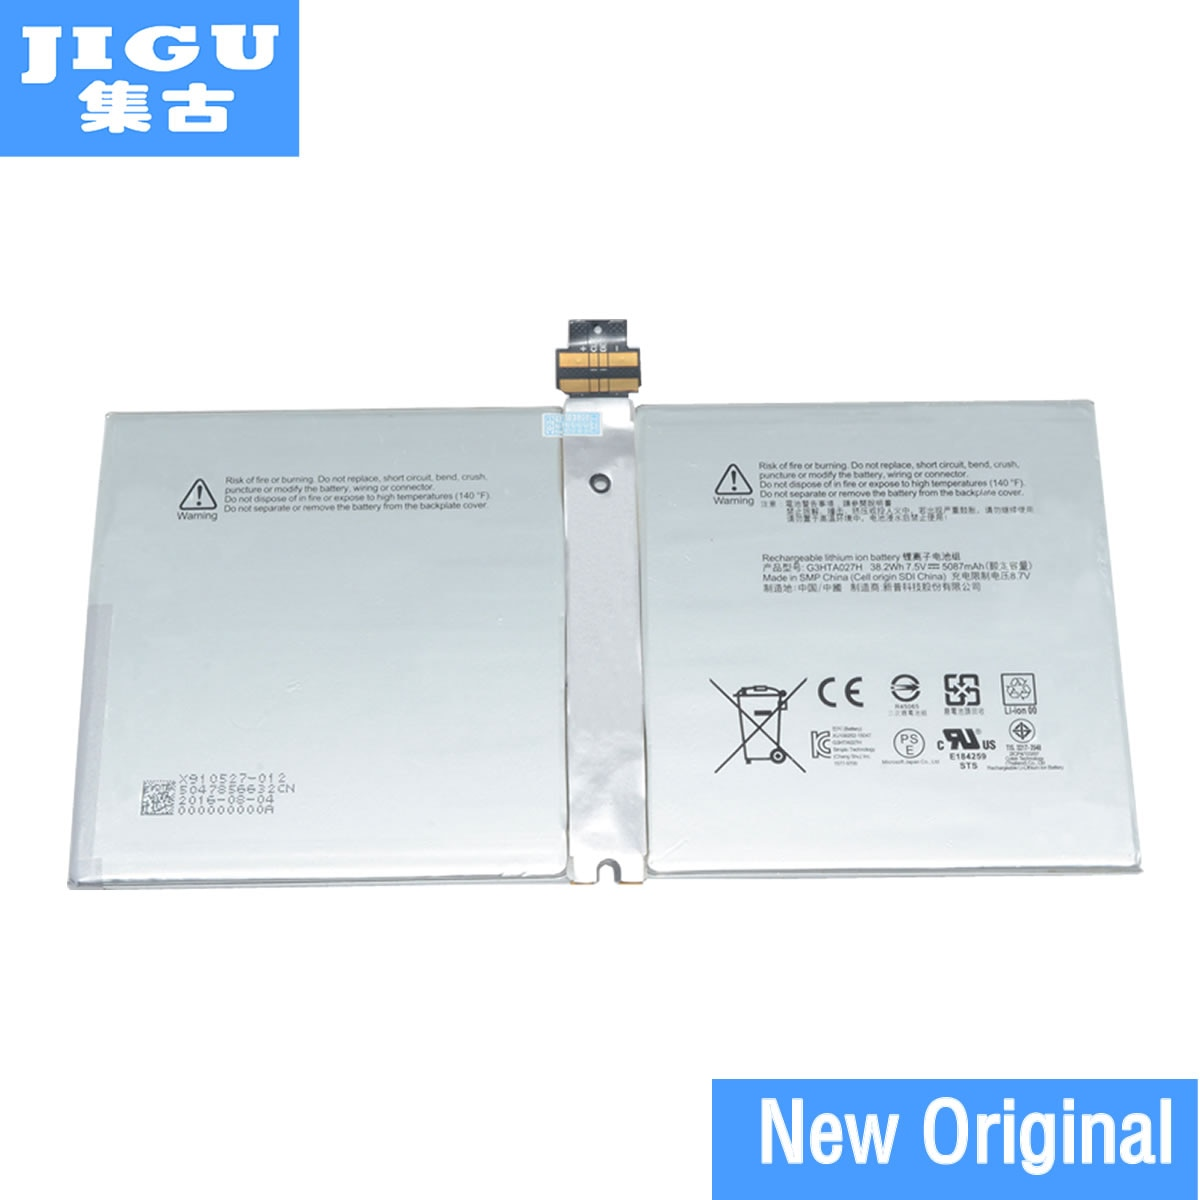 Batería Original para ordenador portátil jgu 7,5 V 16476433753 A1601 DYNR01 G3HTA027H P21GU9 para MICROSOFT Surface Pro 4 1724